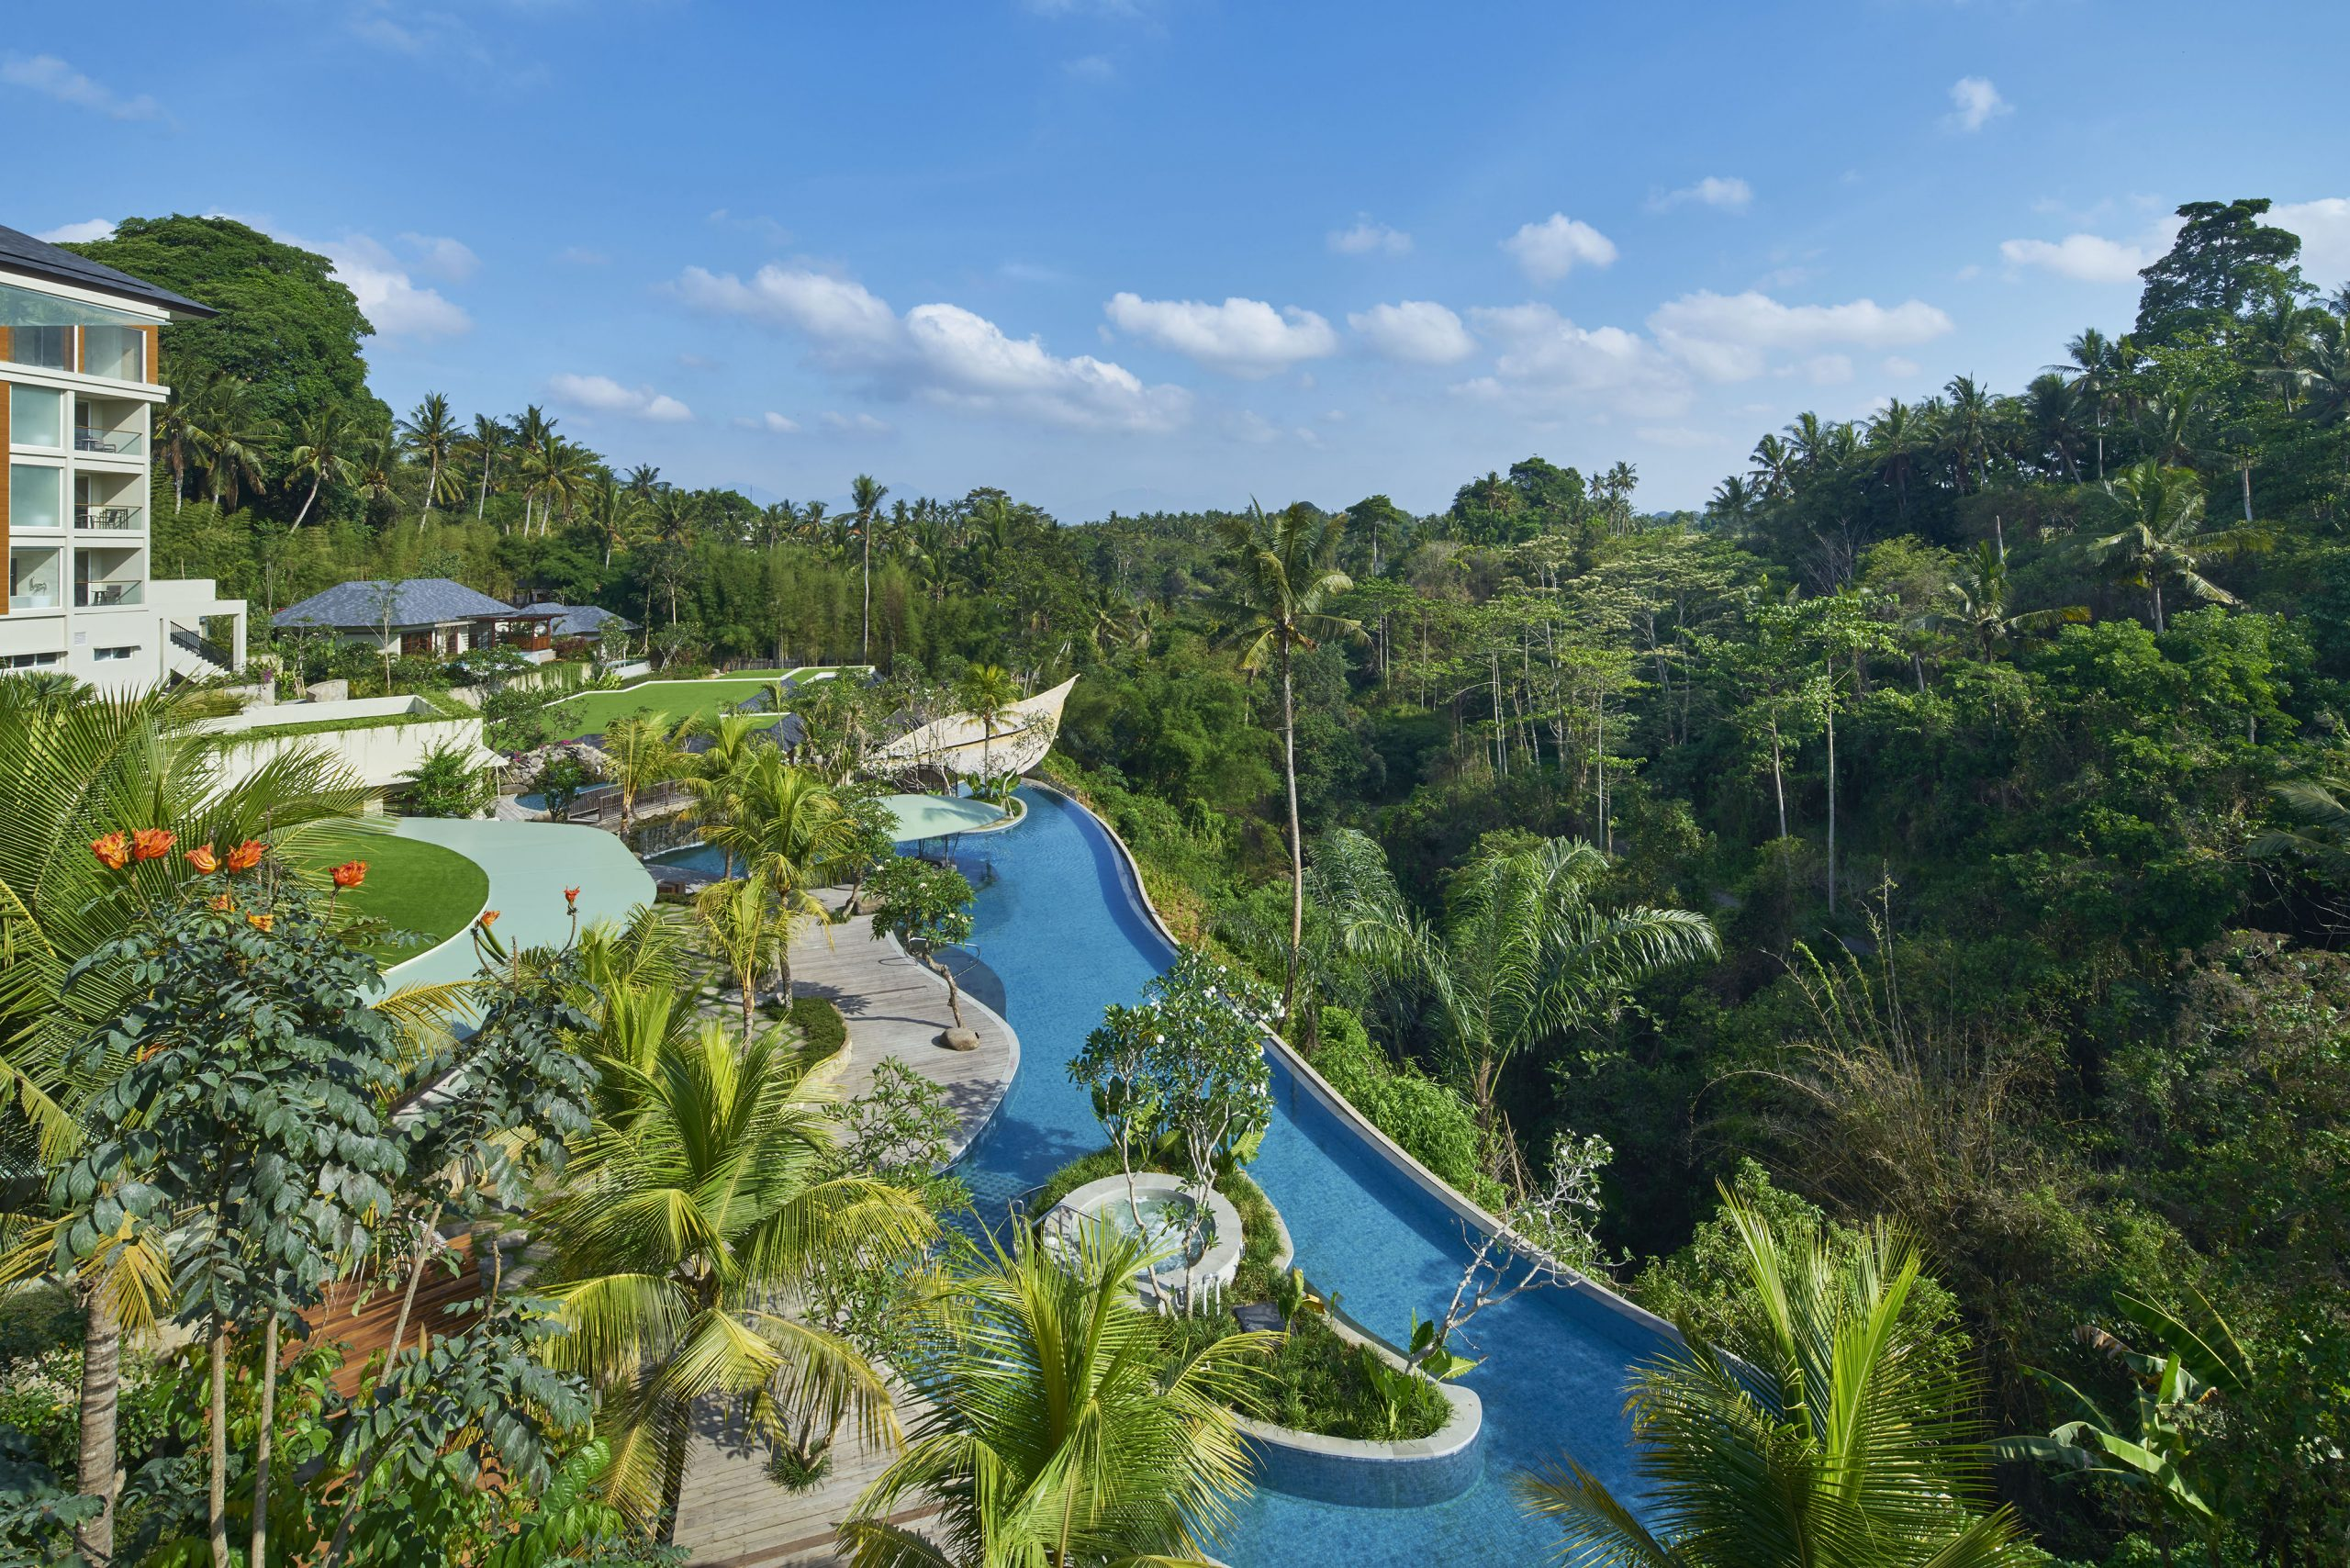 http://highend-traveller.com/the-westin-resort-spa-ubud/